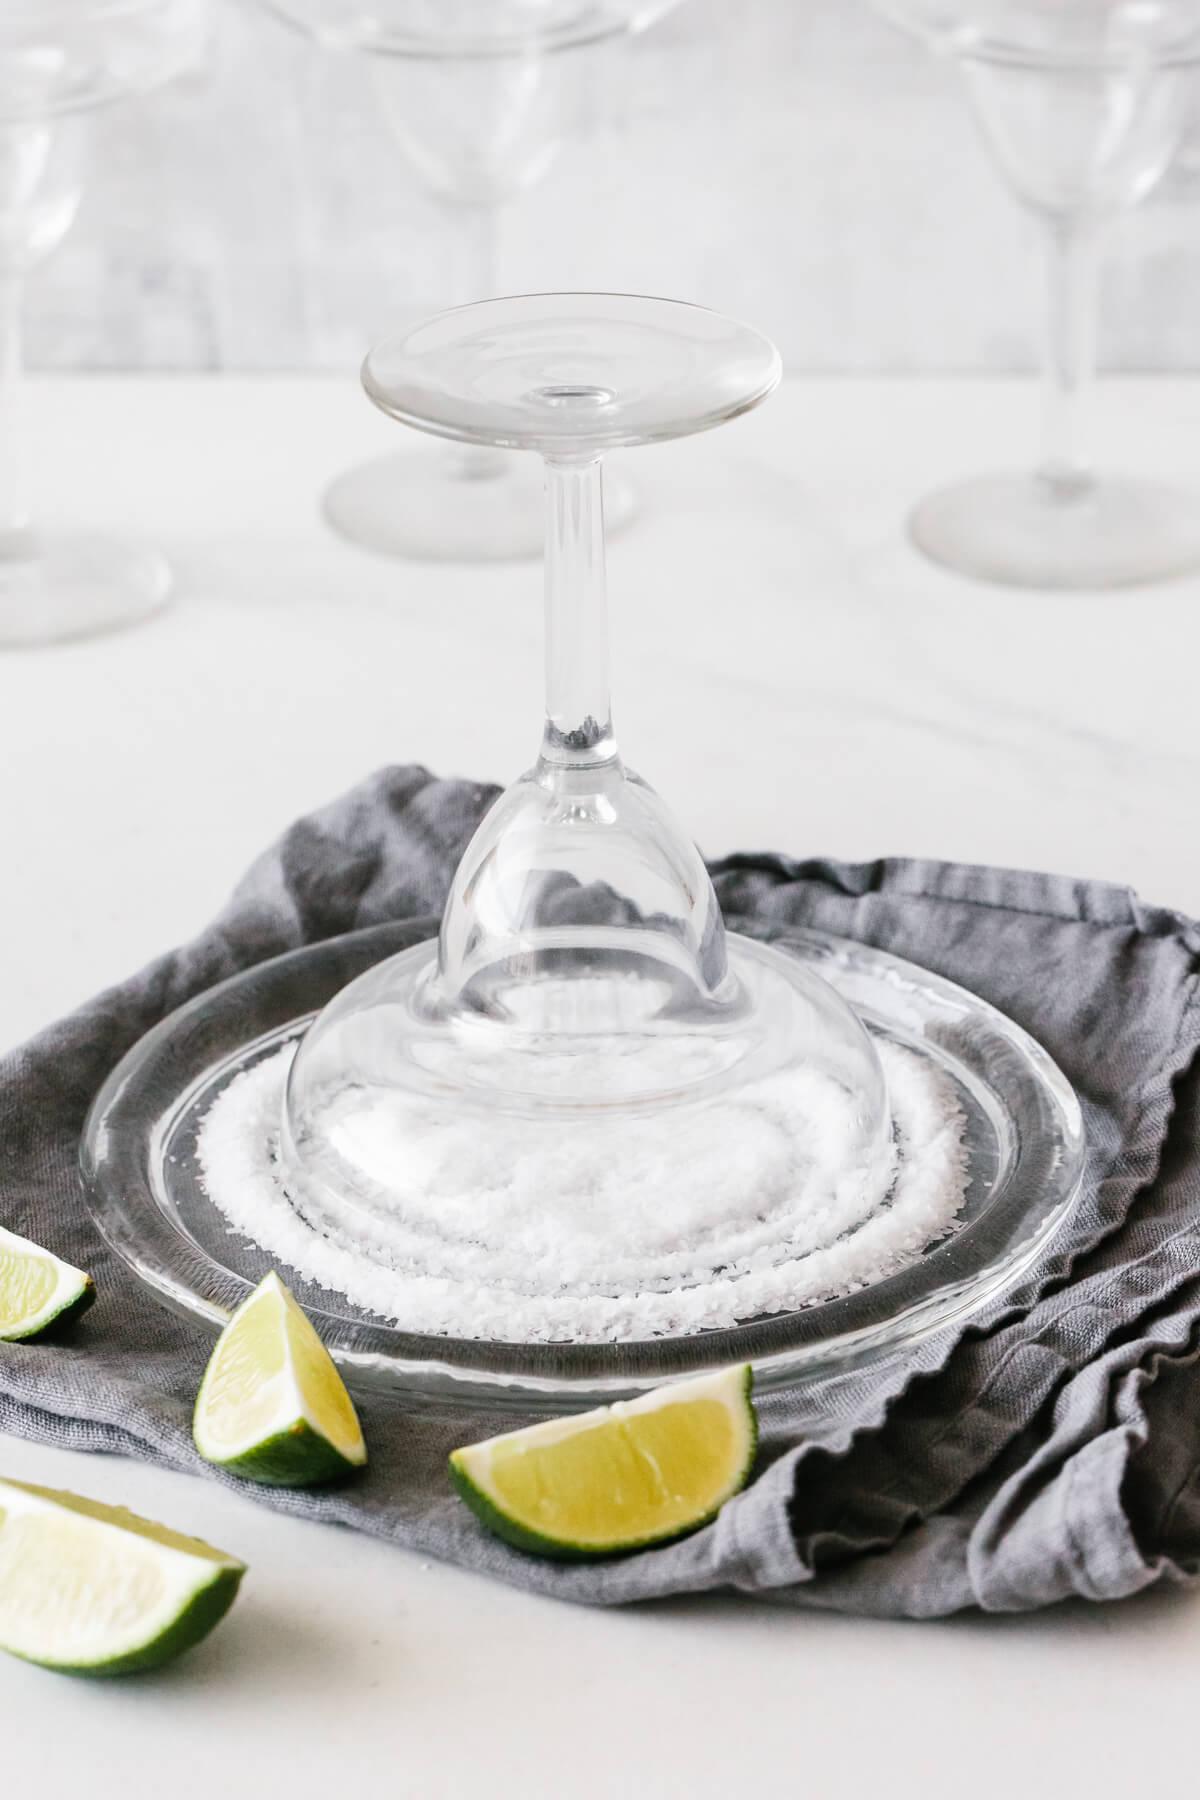 Salting the rim of a strawberry margarita glass.